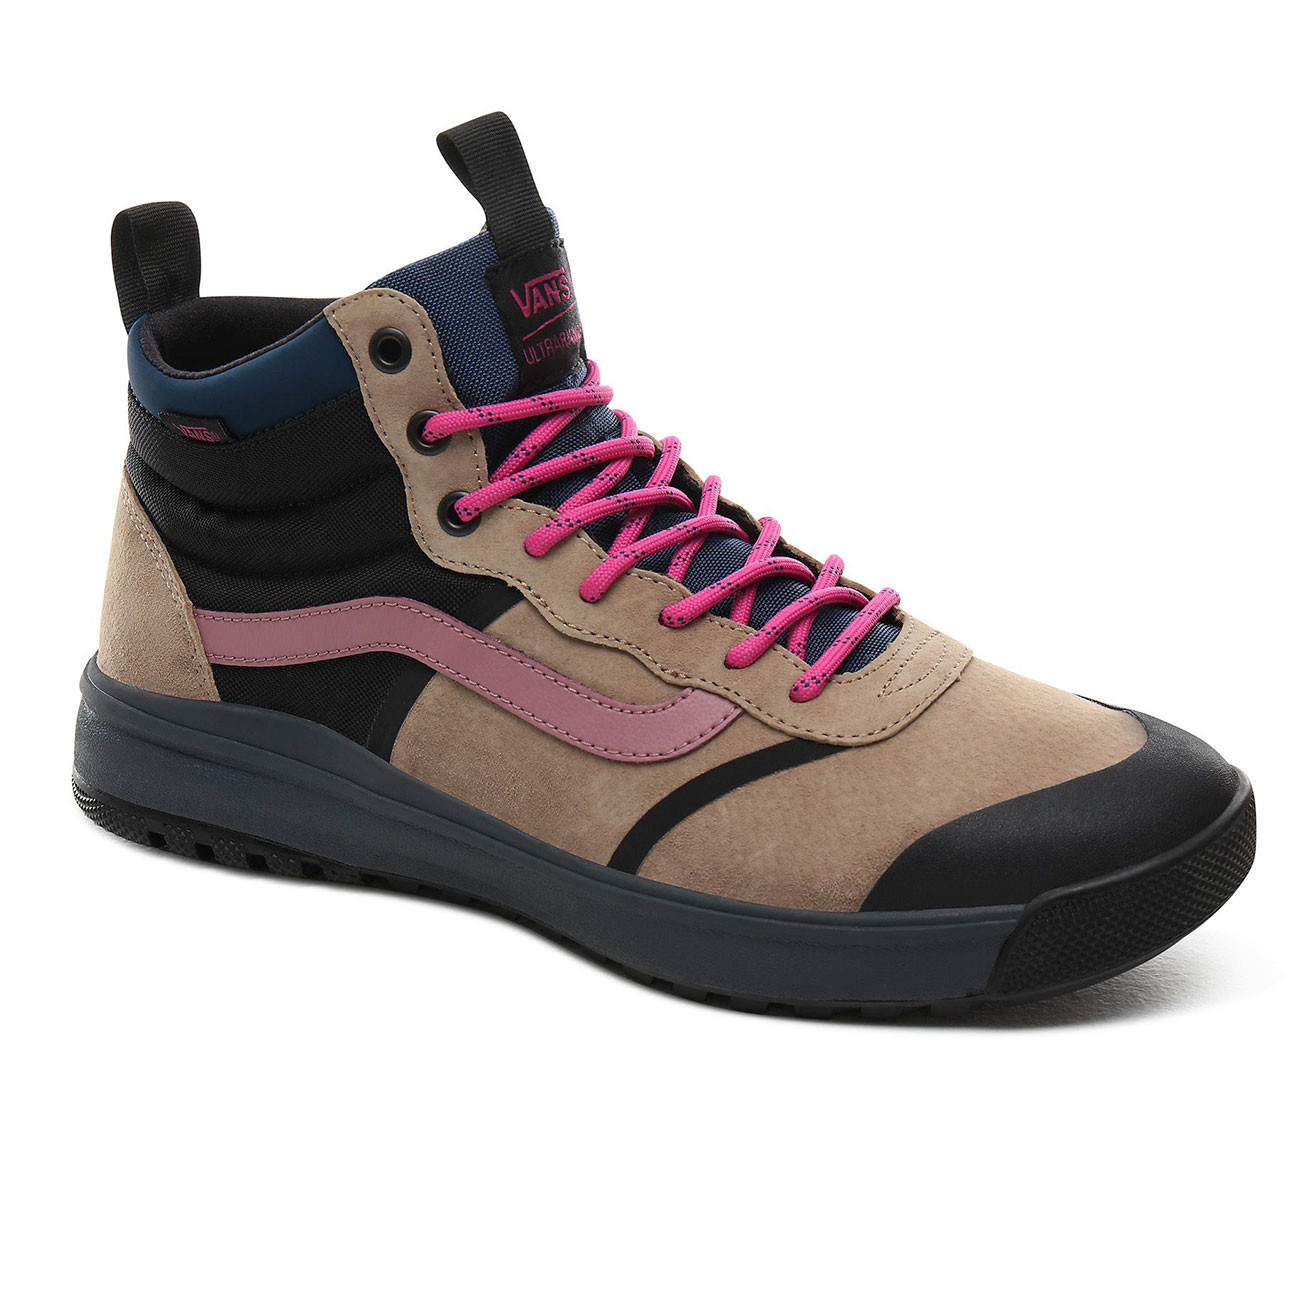 Winter shoes Vans Ultrarange Hi DL MTE